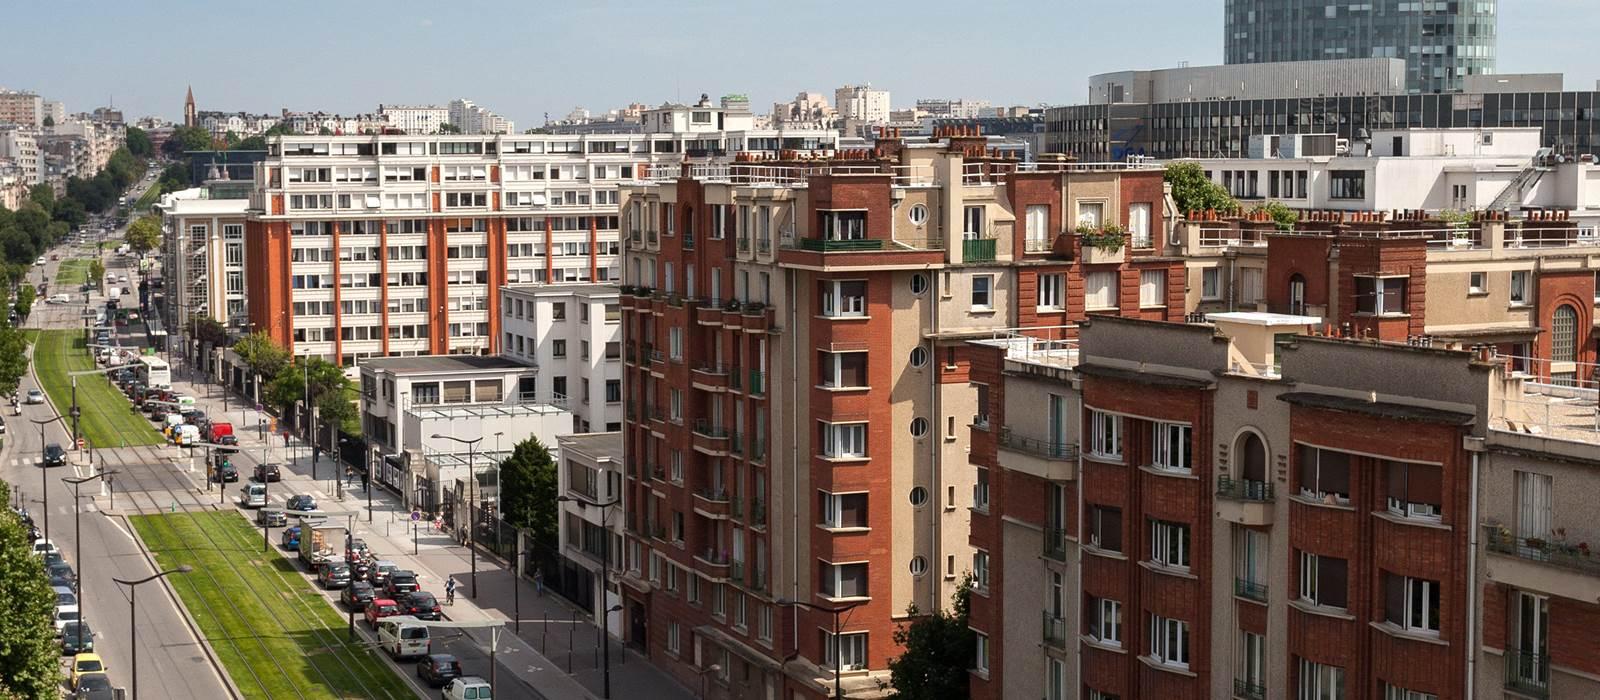 where to find us median paris porte de versailles hotel. Black Bedroom Furniture Sets. Home Design Ideas